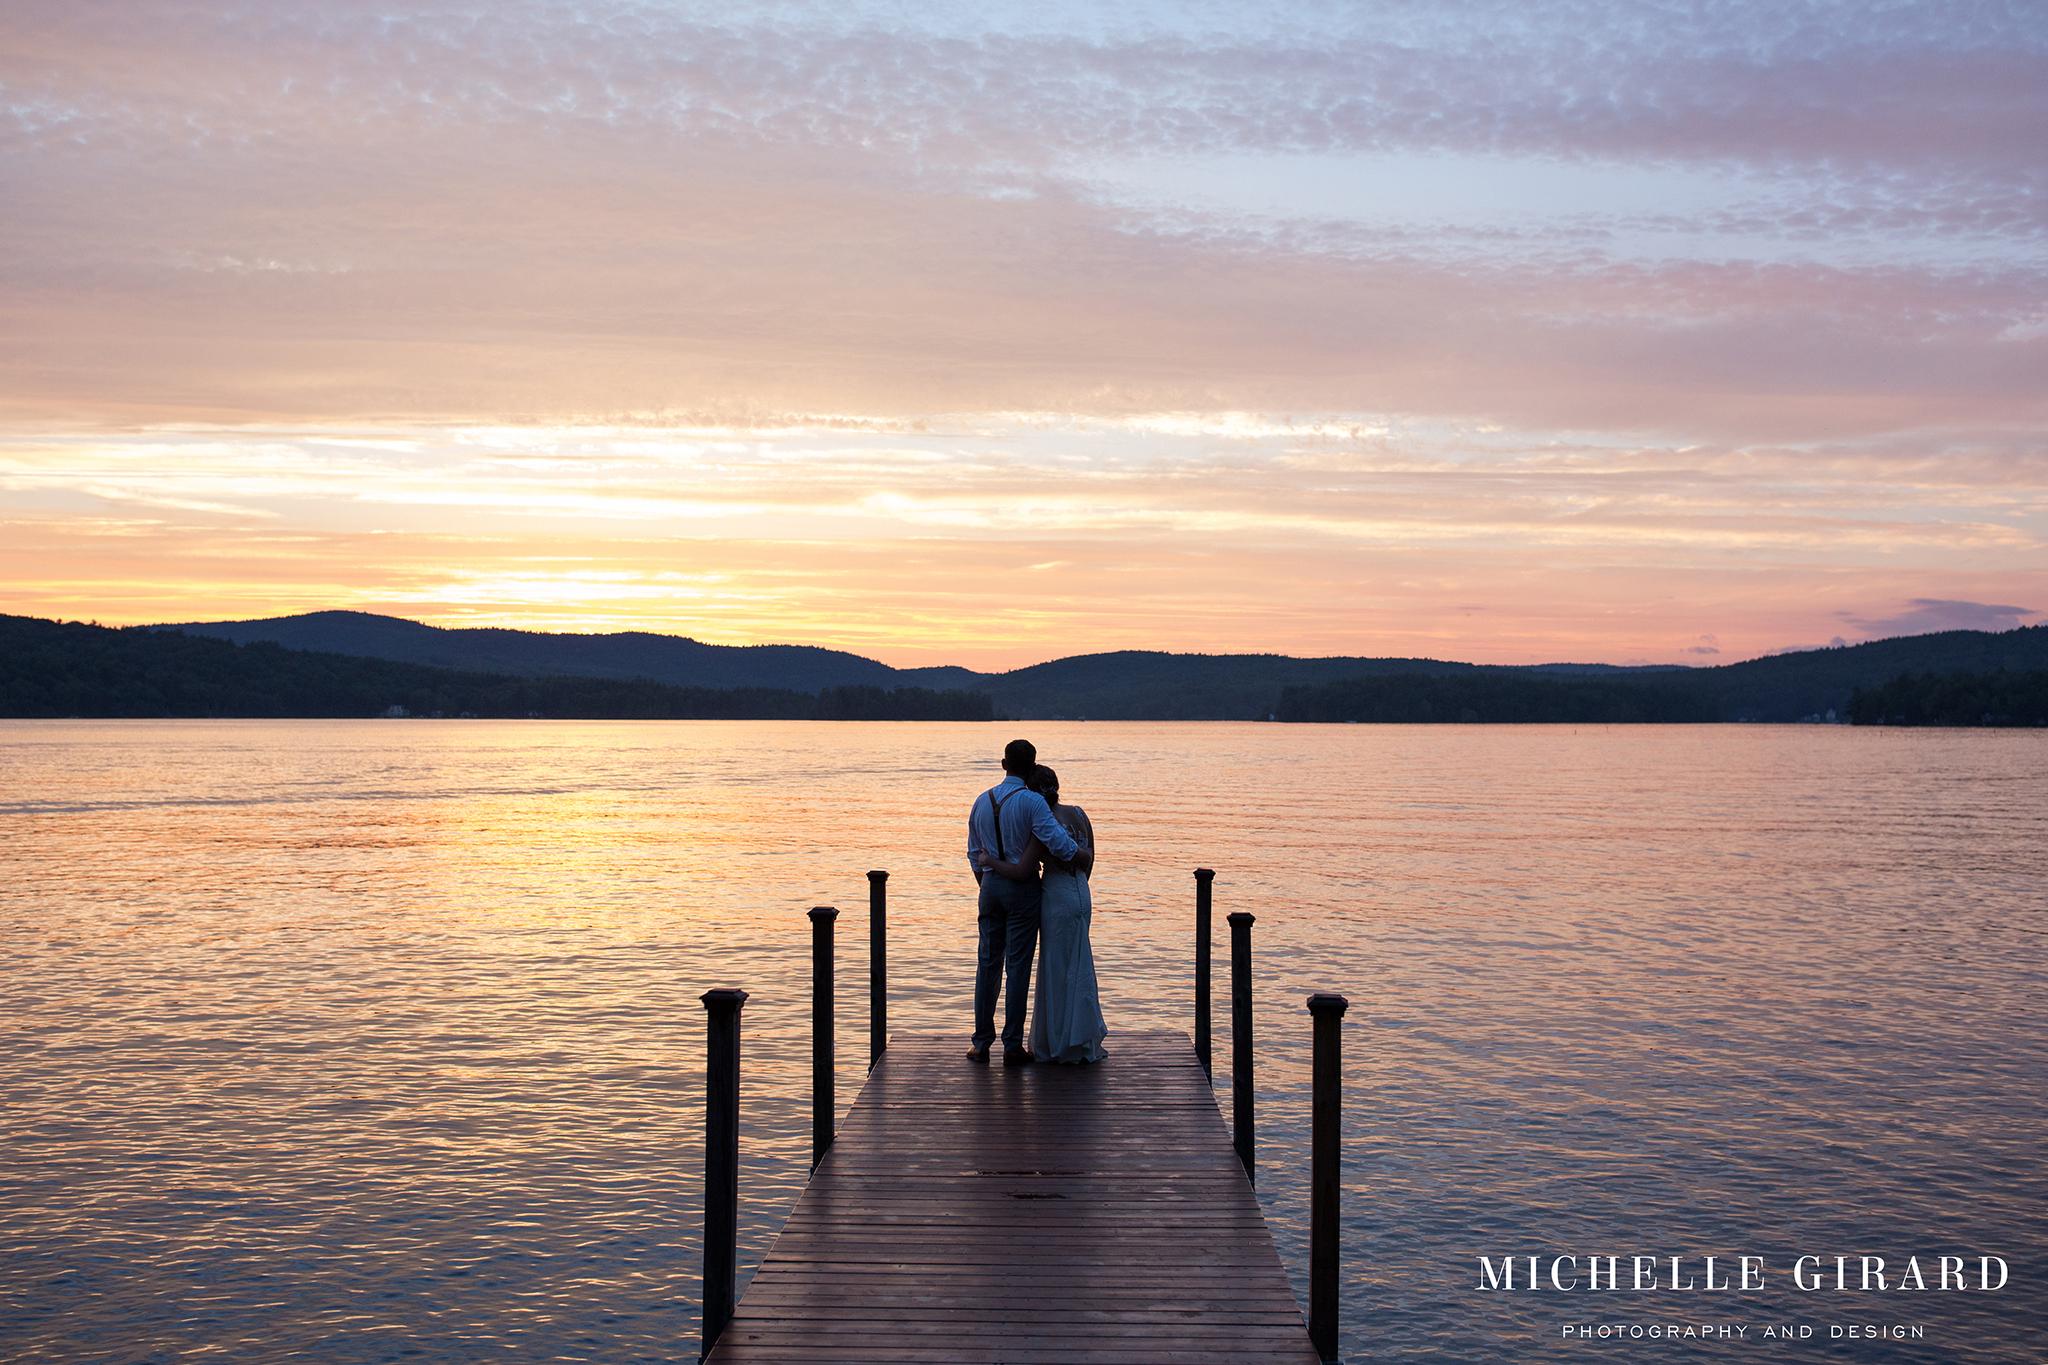 LakeWinnipesaukeeWedding_MeredithNH_LakesideTentWedding_MichelleGirardPhotography1.jpg